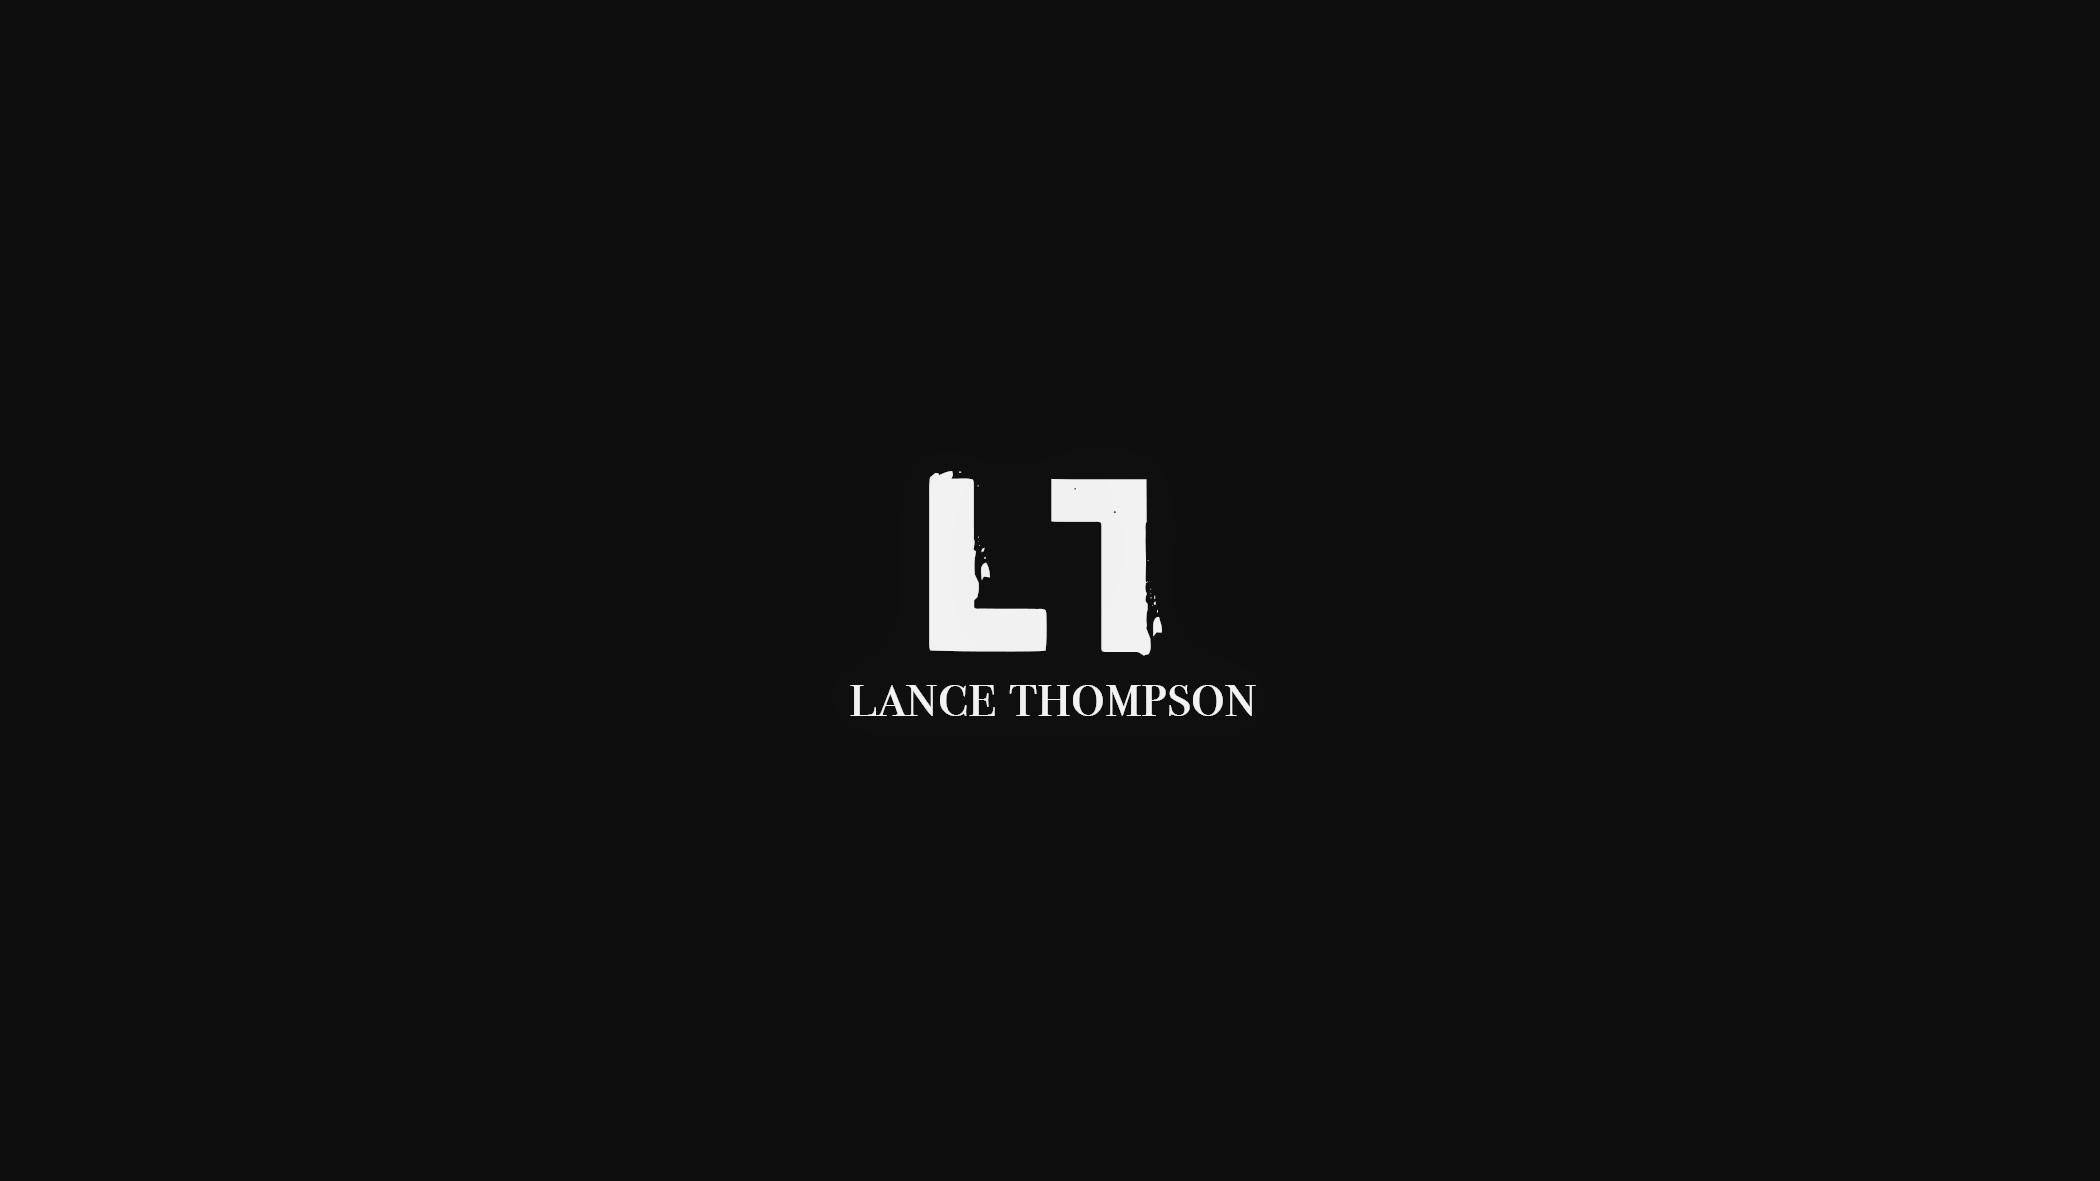 Lance Thompson Music